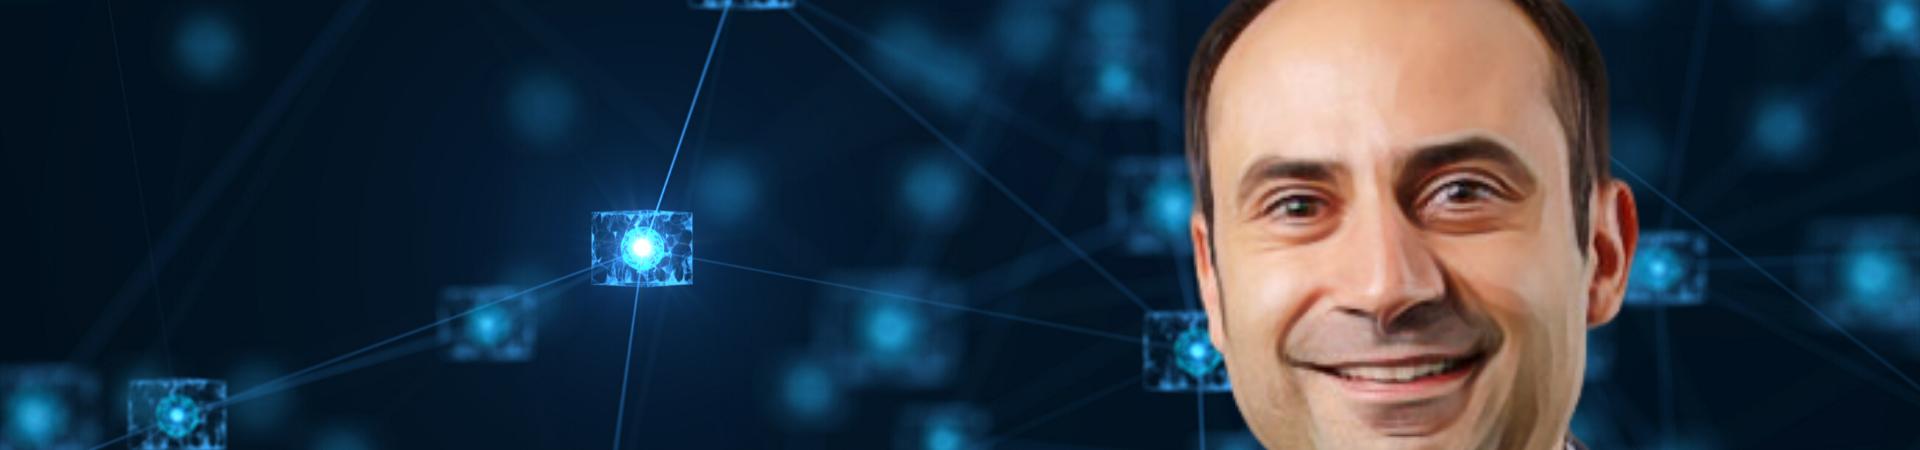 Blockchain Can Not Change Industry Fundamentally: Julien Collin